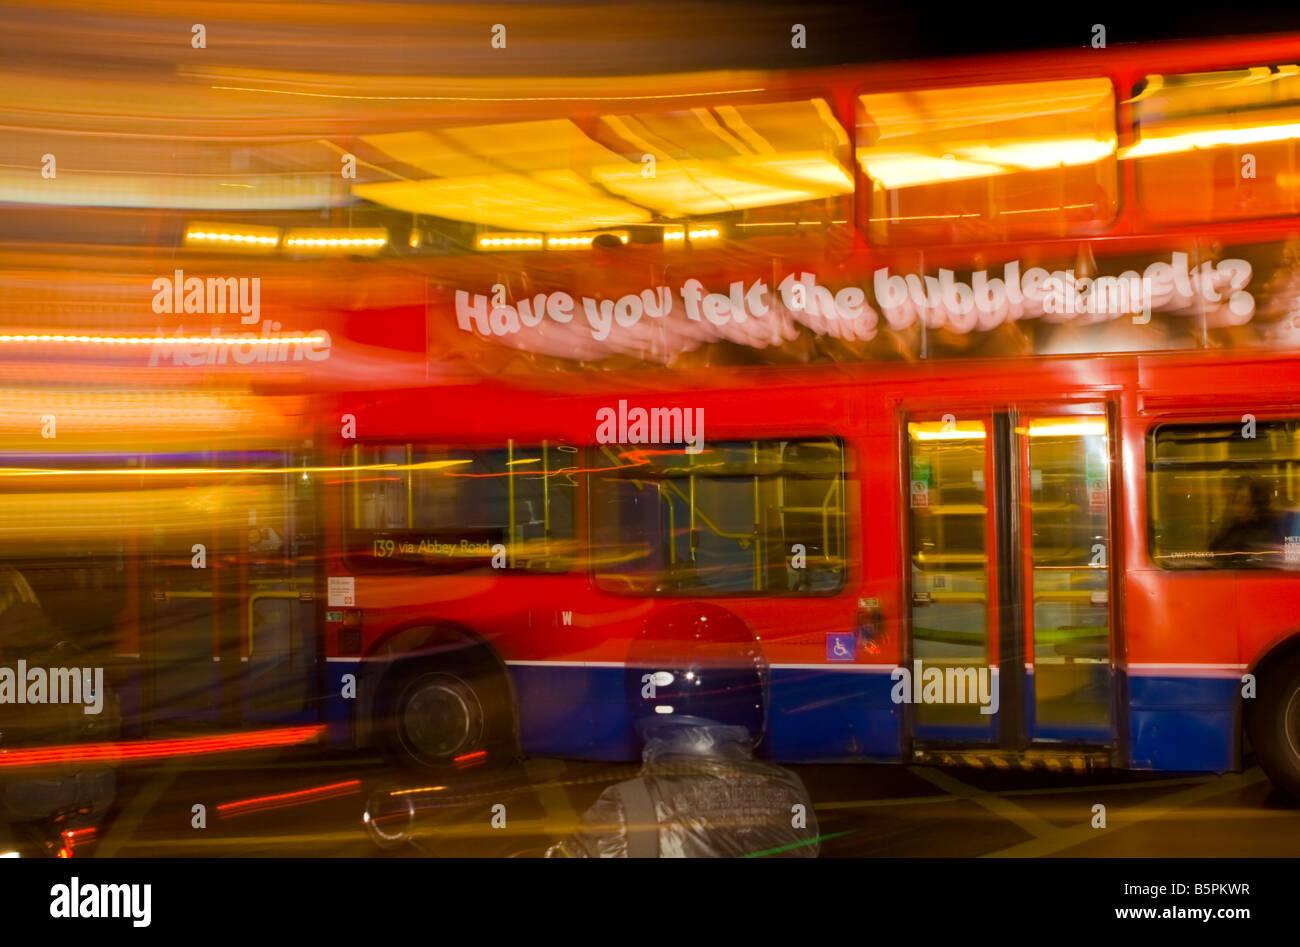 London Bus at Night - Stock Image